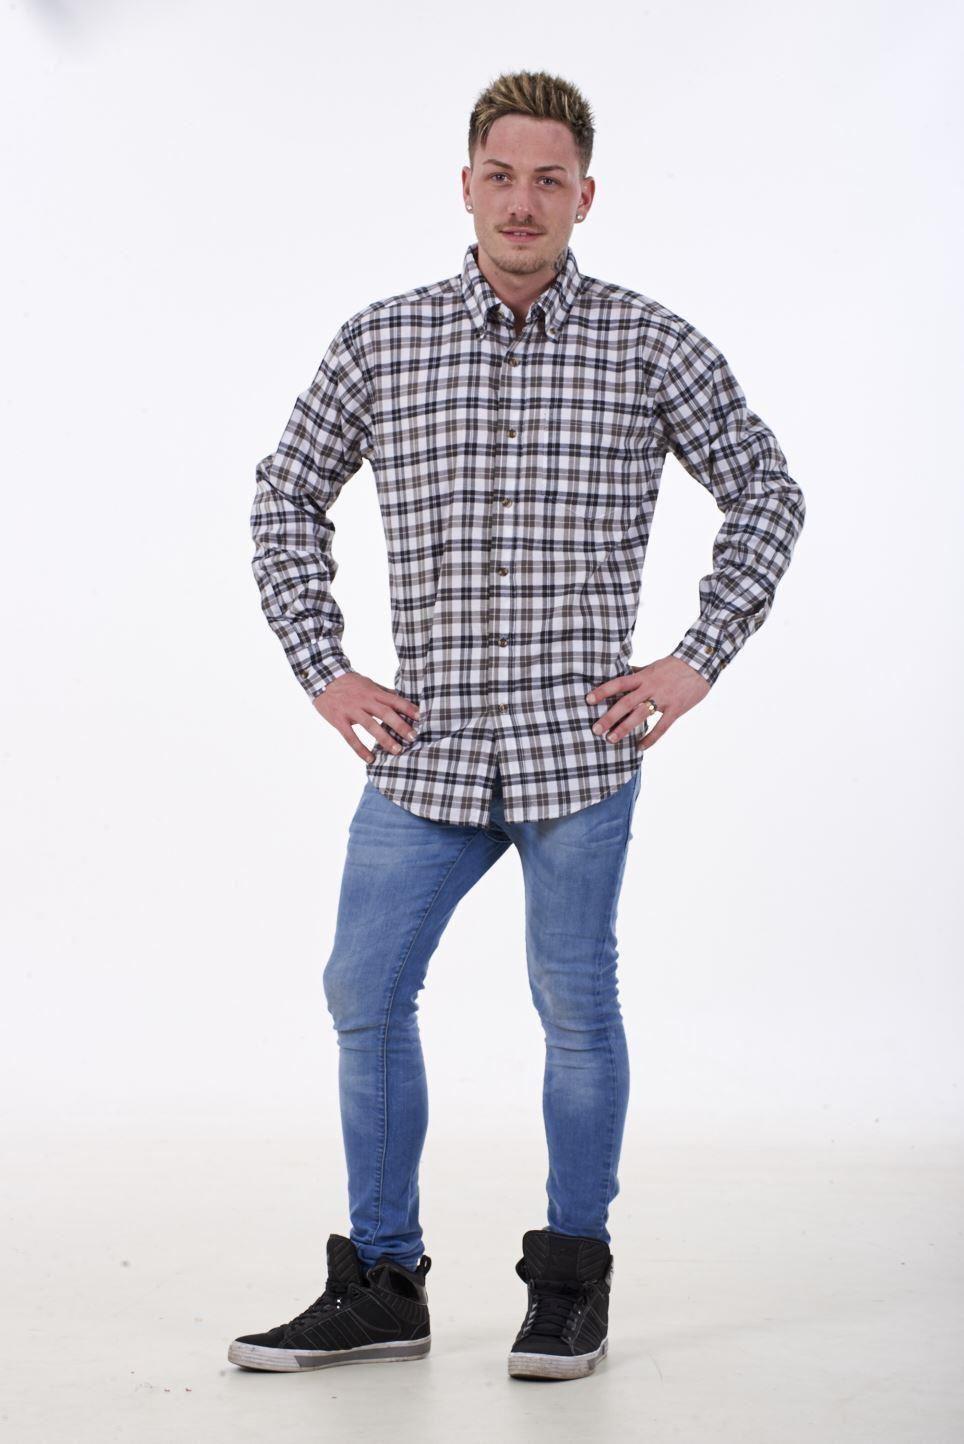 551c60ae Mens Checked Shirt Malay Apparel Cotton Casual Wear Long Sleeve ...